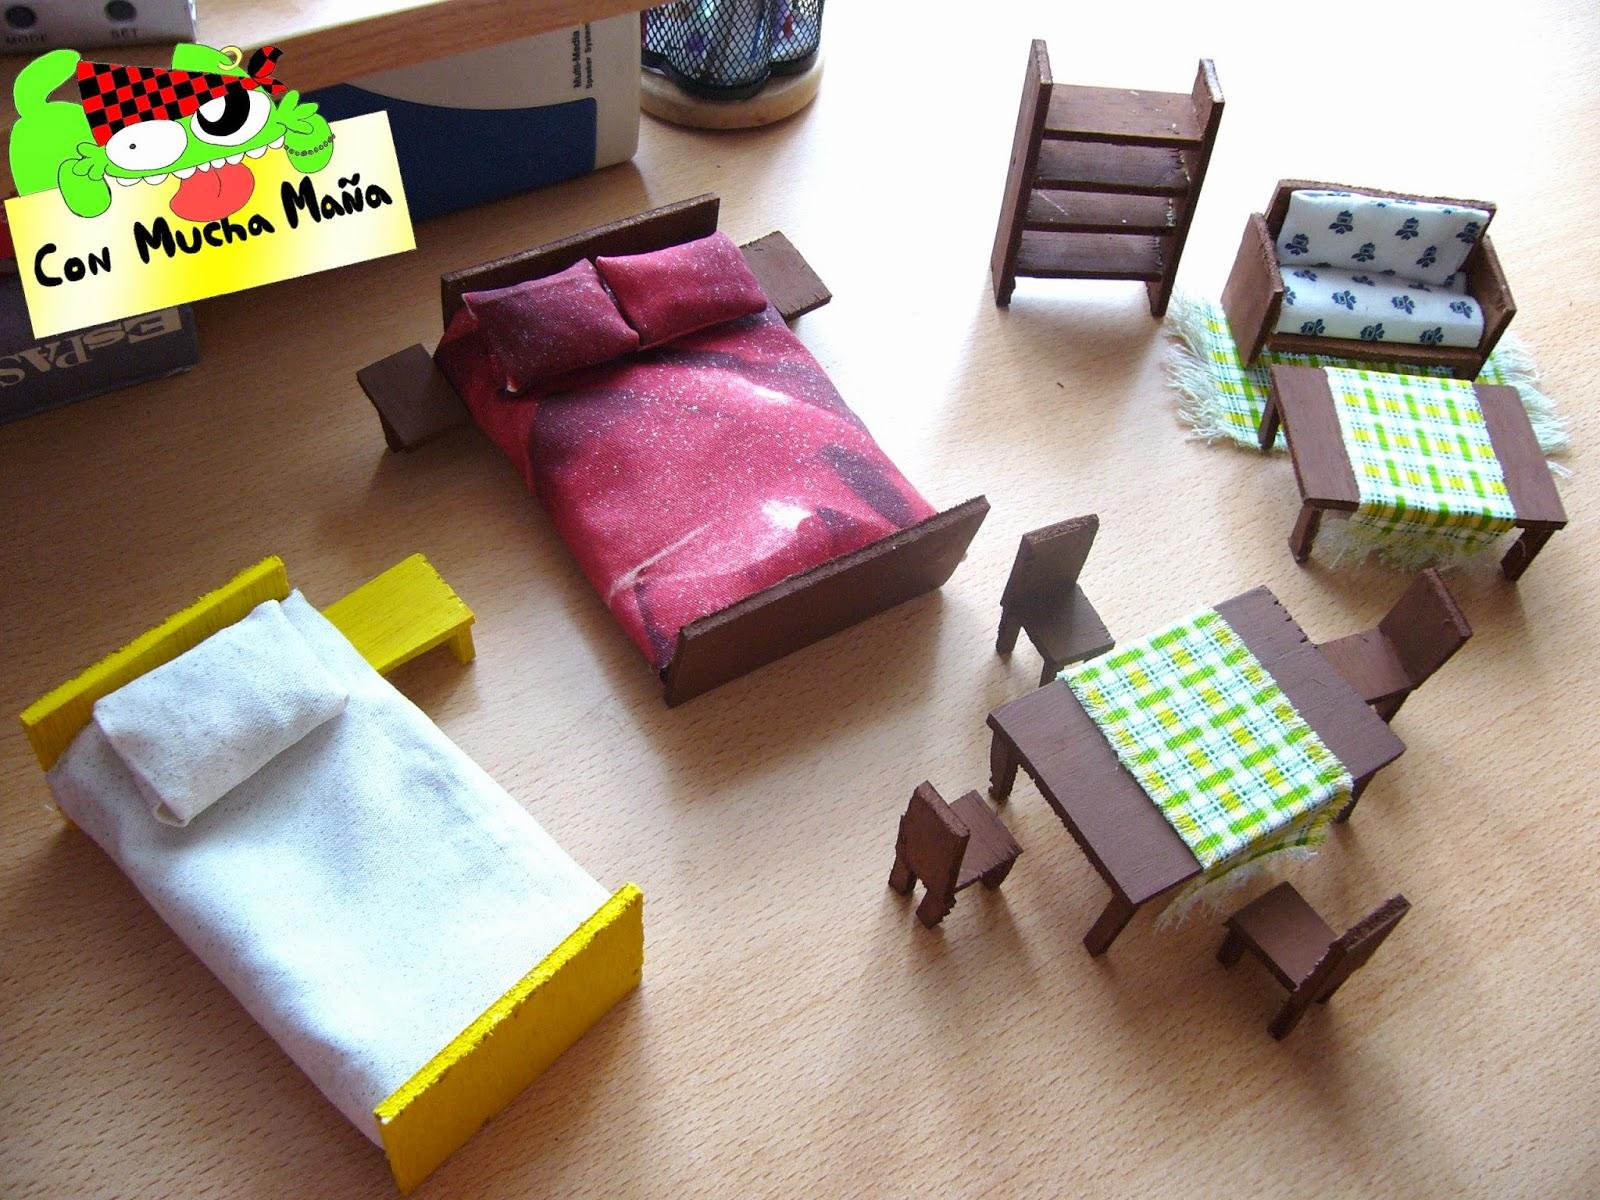 Muebles casa de munecas manualidades 20170718234311 for De casa muebles